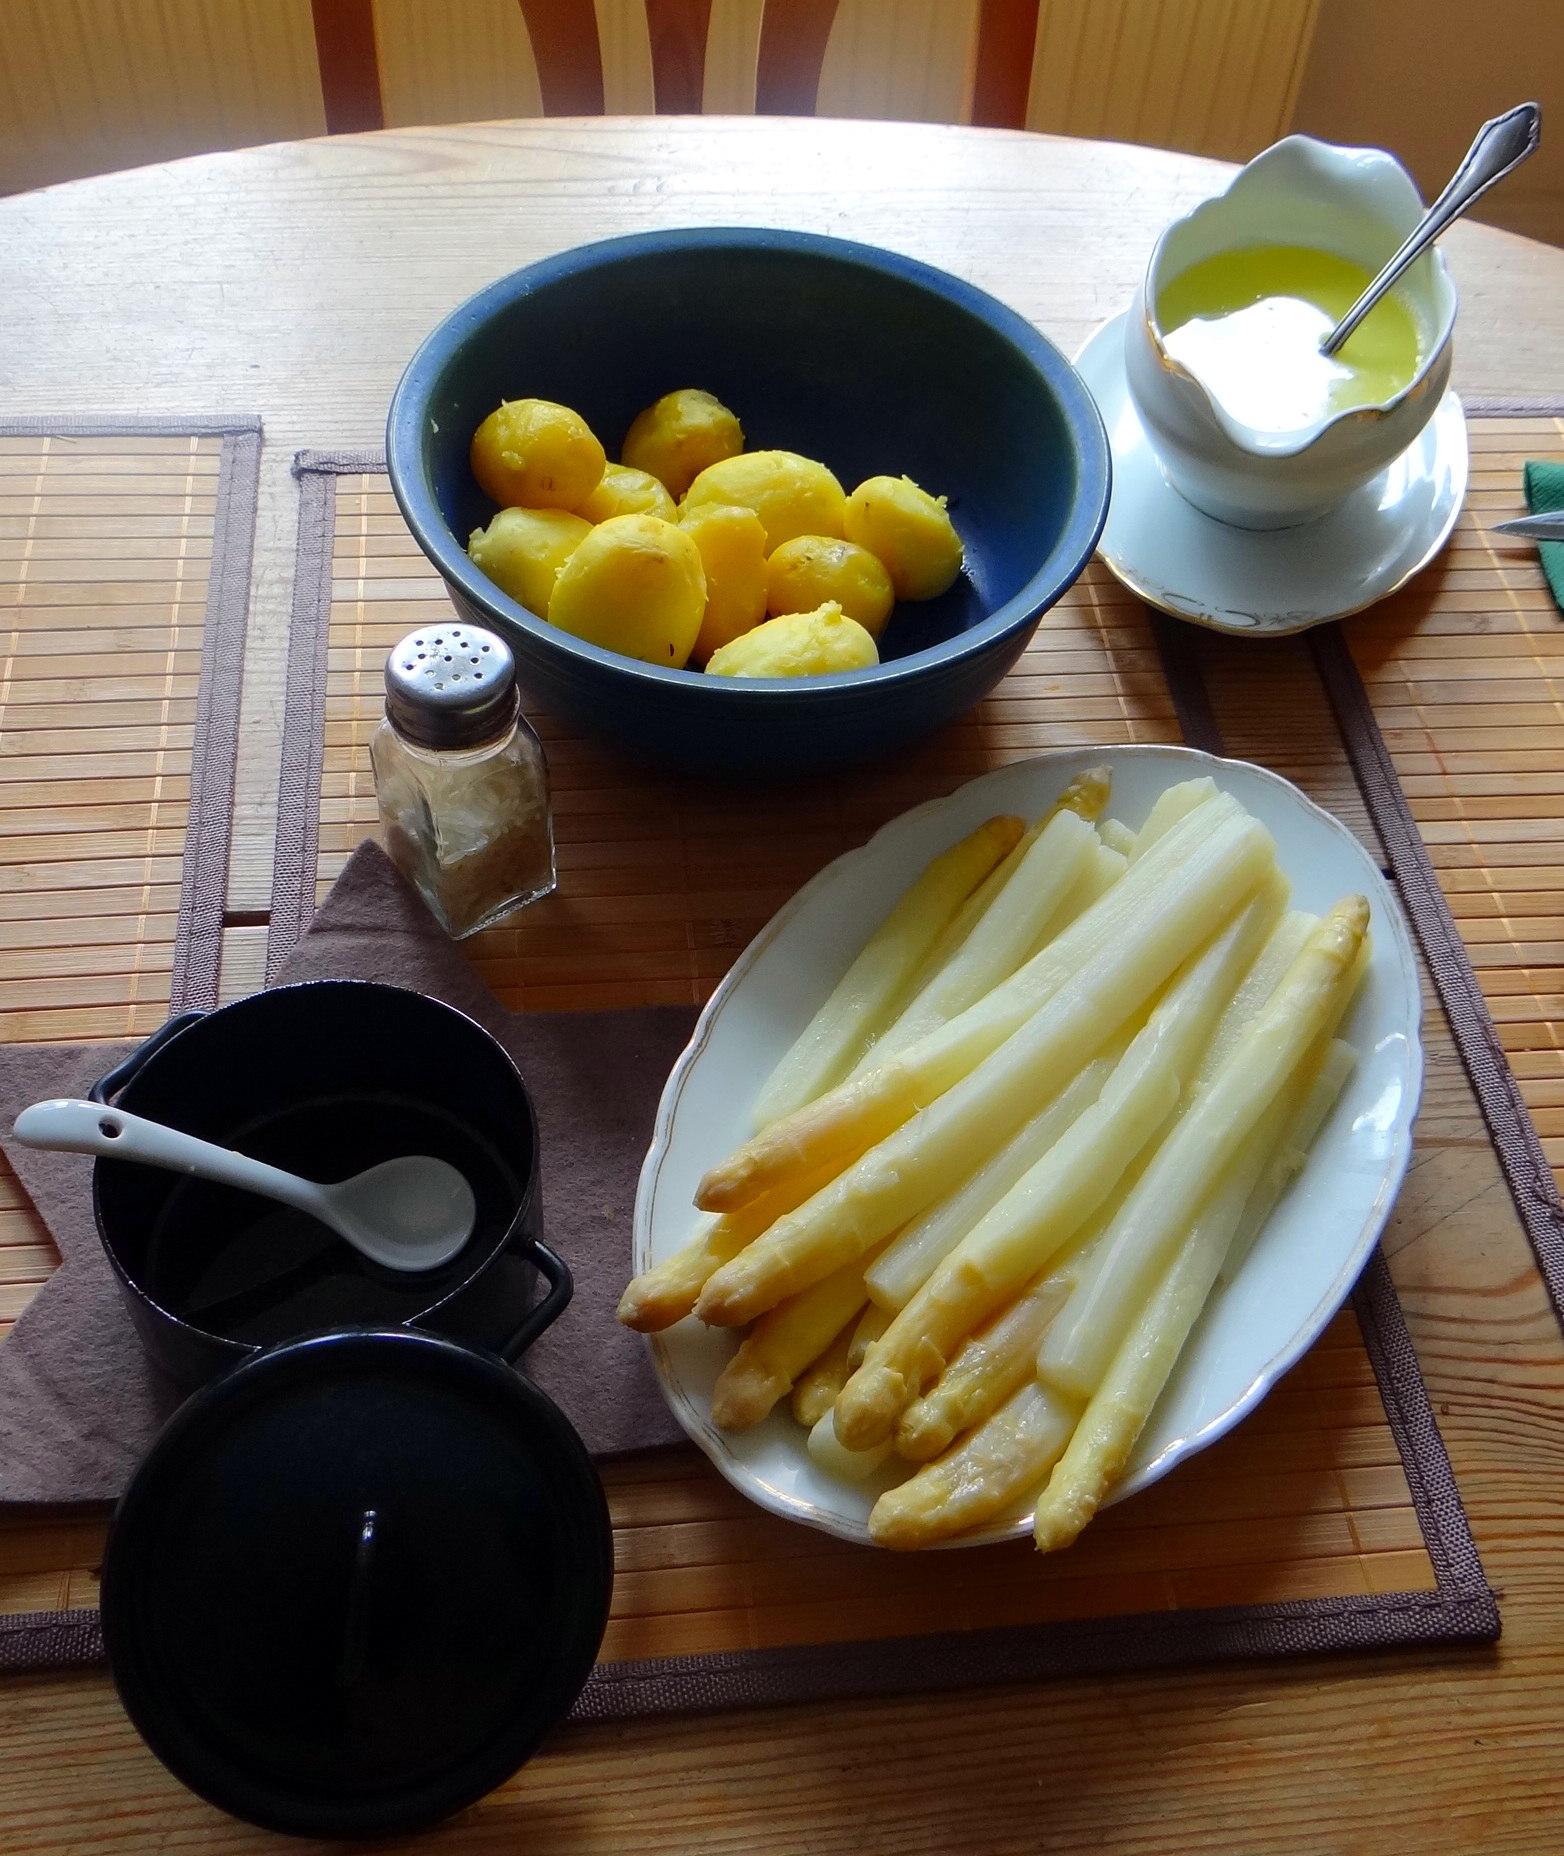 Spargel,Pellkartoffeln,Nussbutter,Quarkspeise,vegetarisch (3)